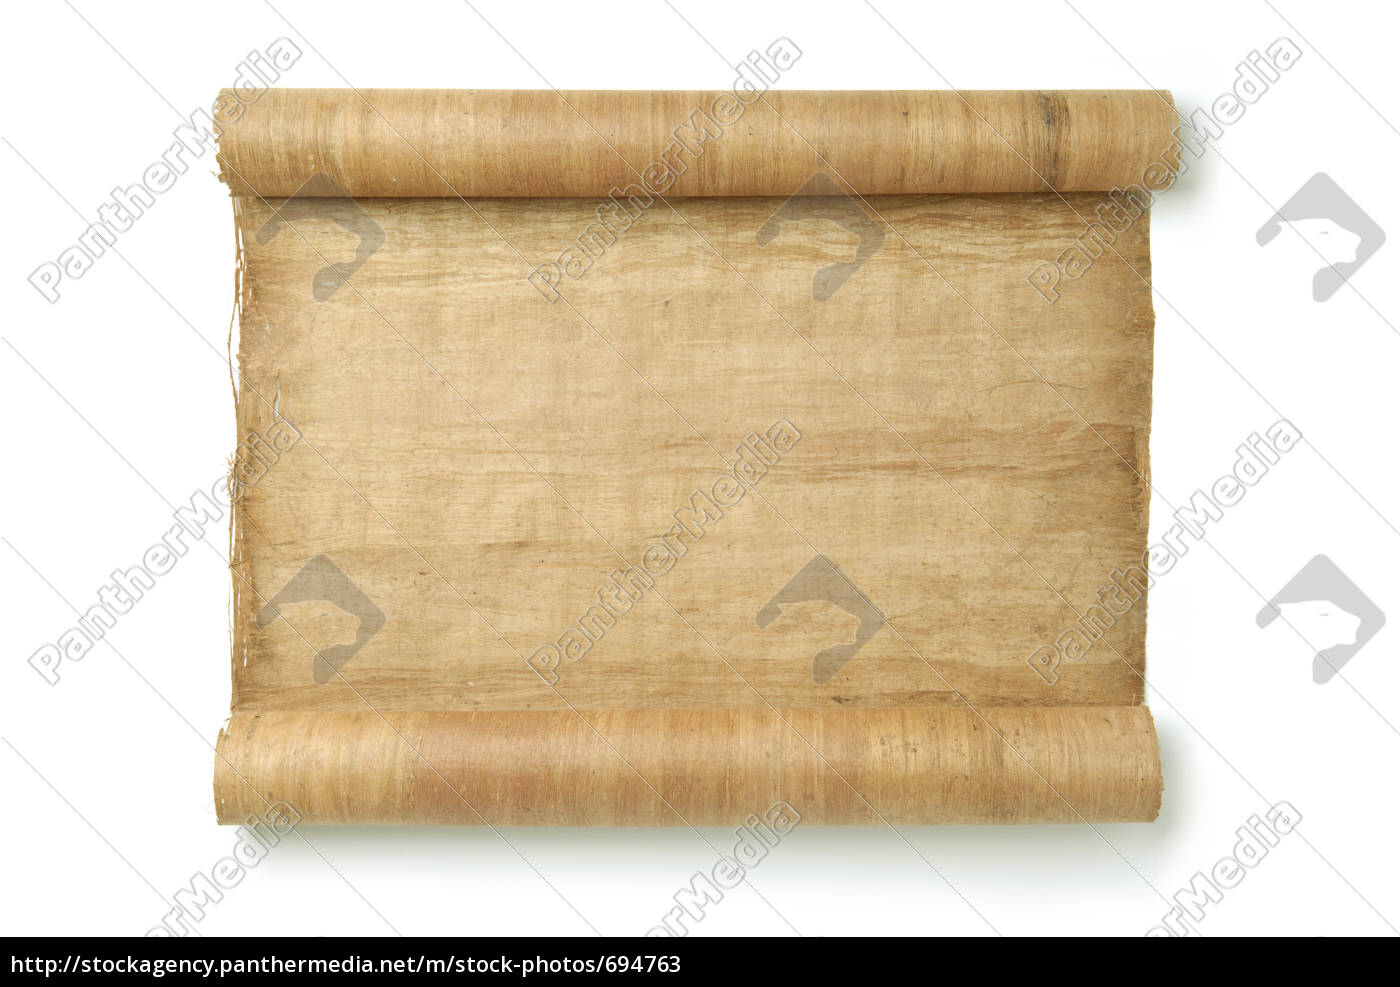 scroll - 694763